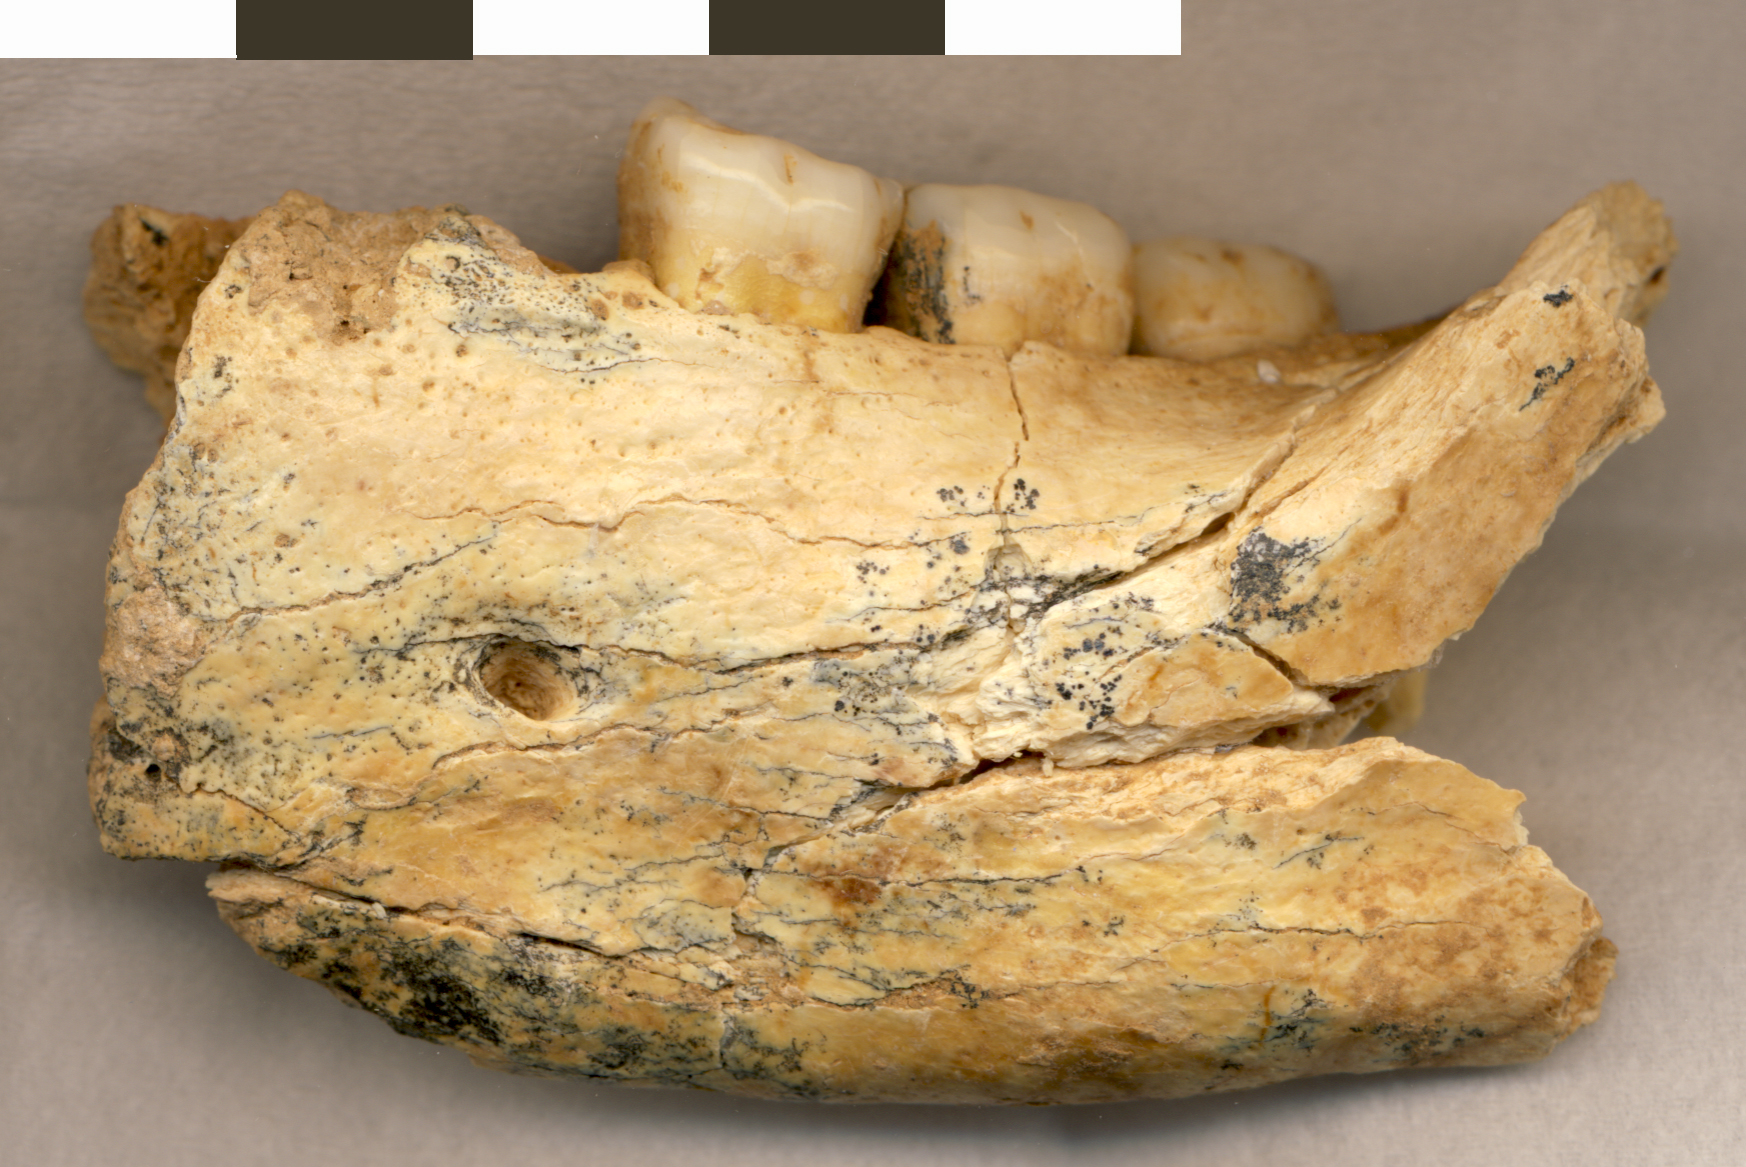 La mascella fossile di Mala Balanica (fonte: University of Winnipeg)